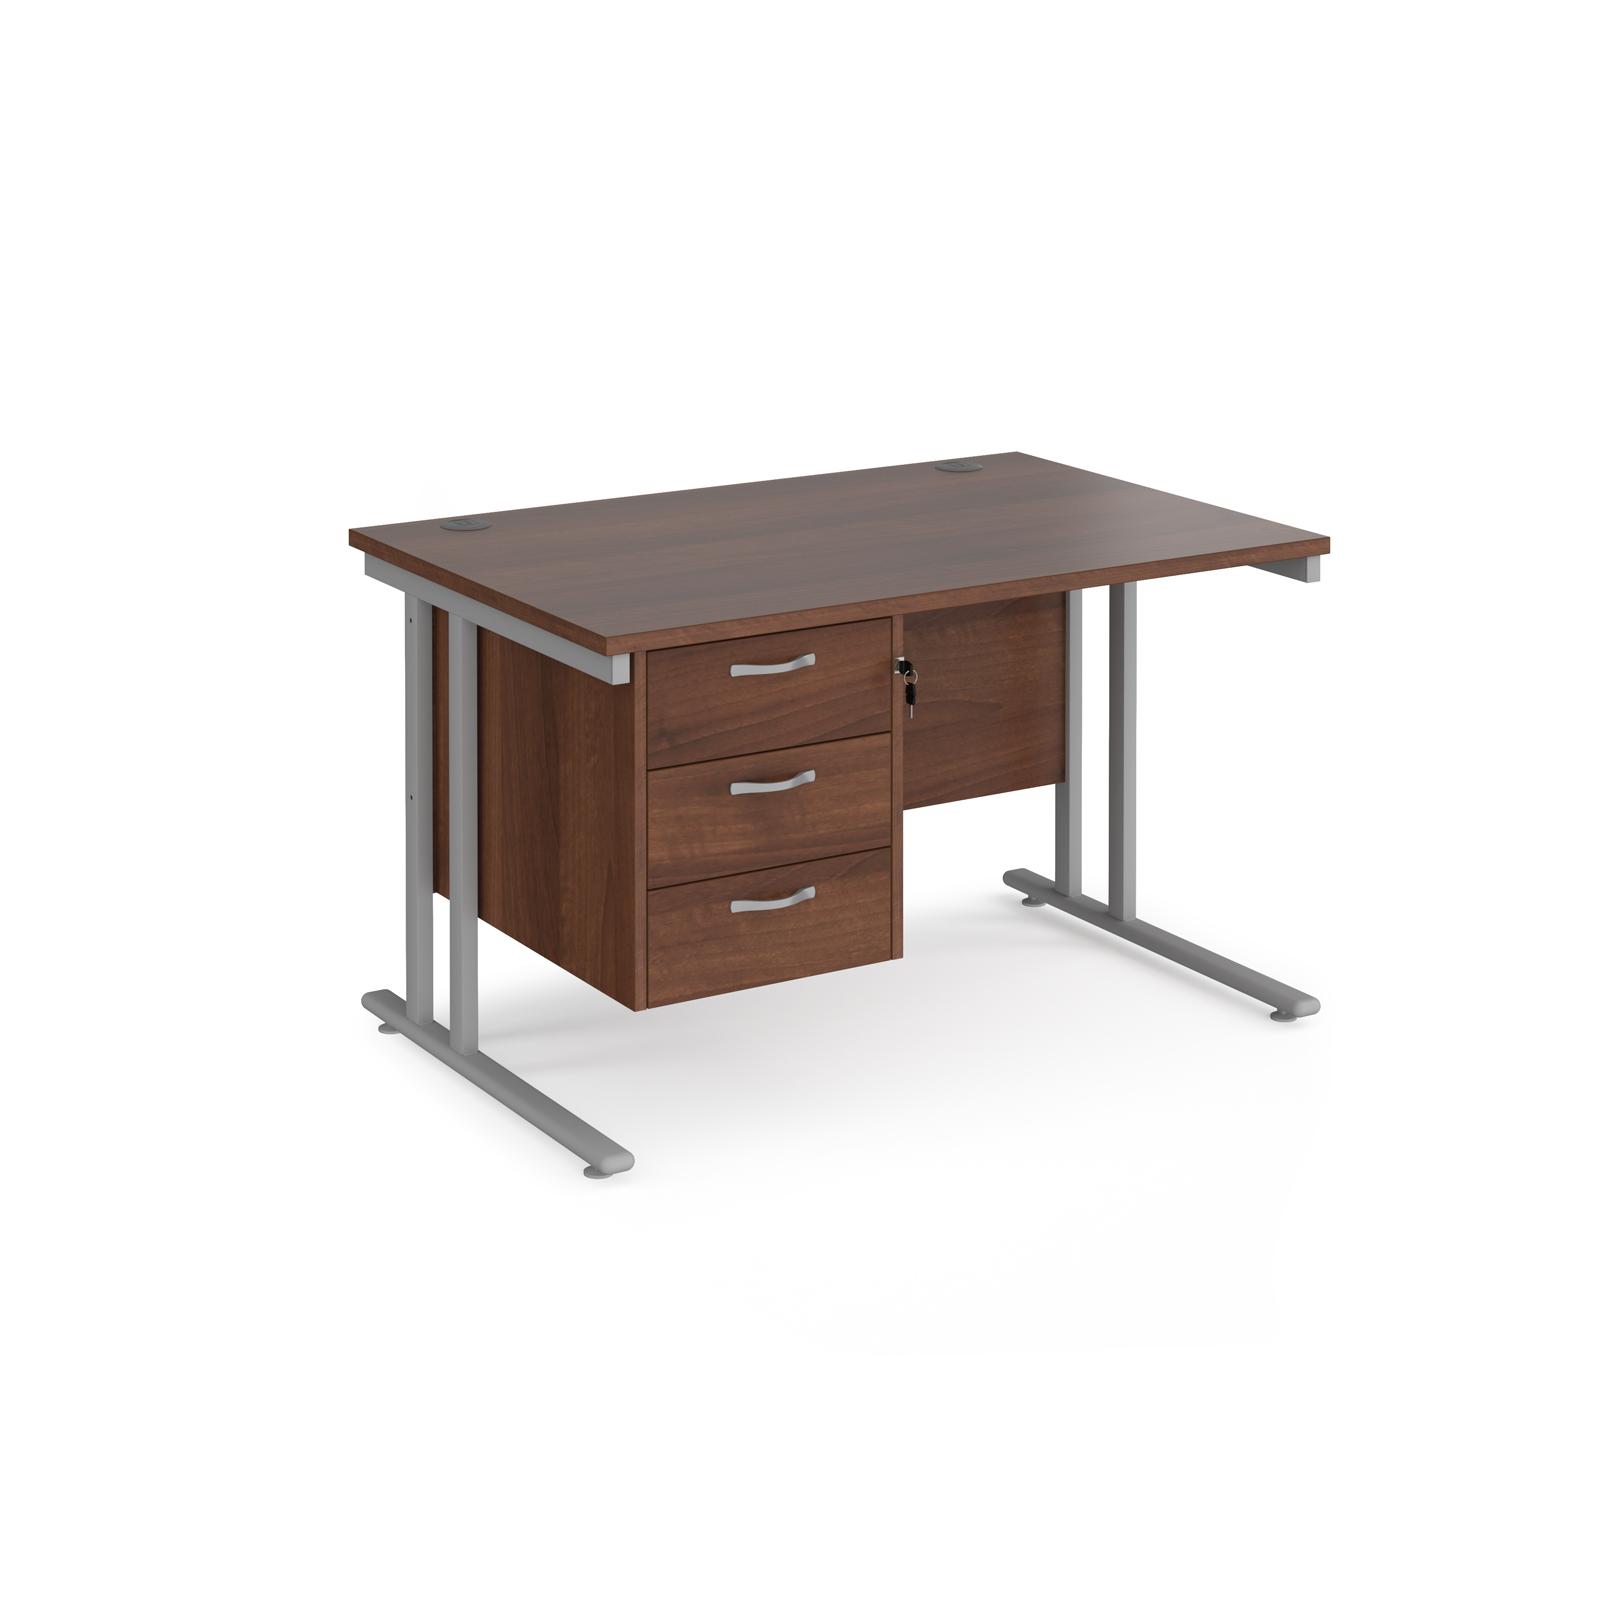 Rectangular Desks Maestro 25 straight desk 1200mm x 800mm with 3 drawer pedestal - silver cantilever leg frame, walnut top